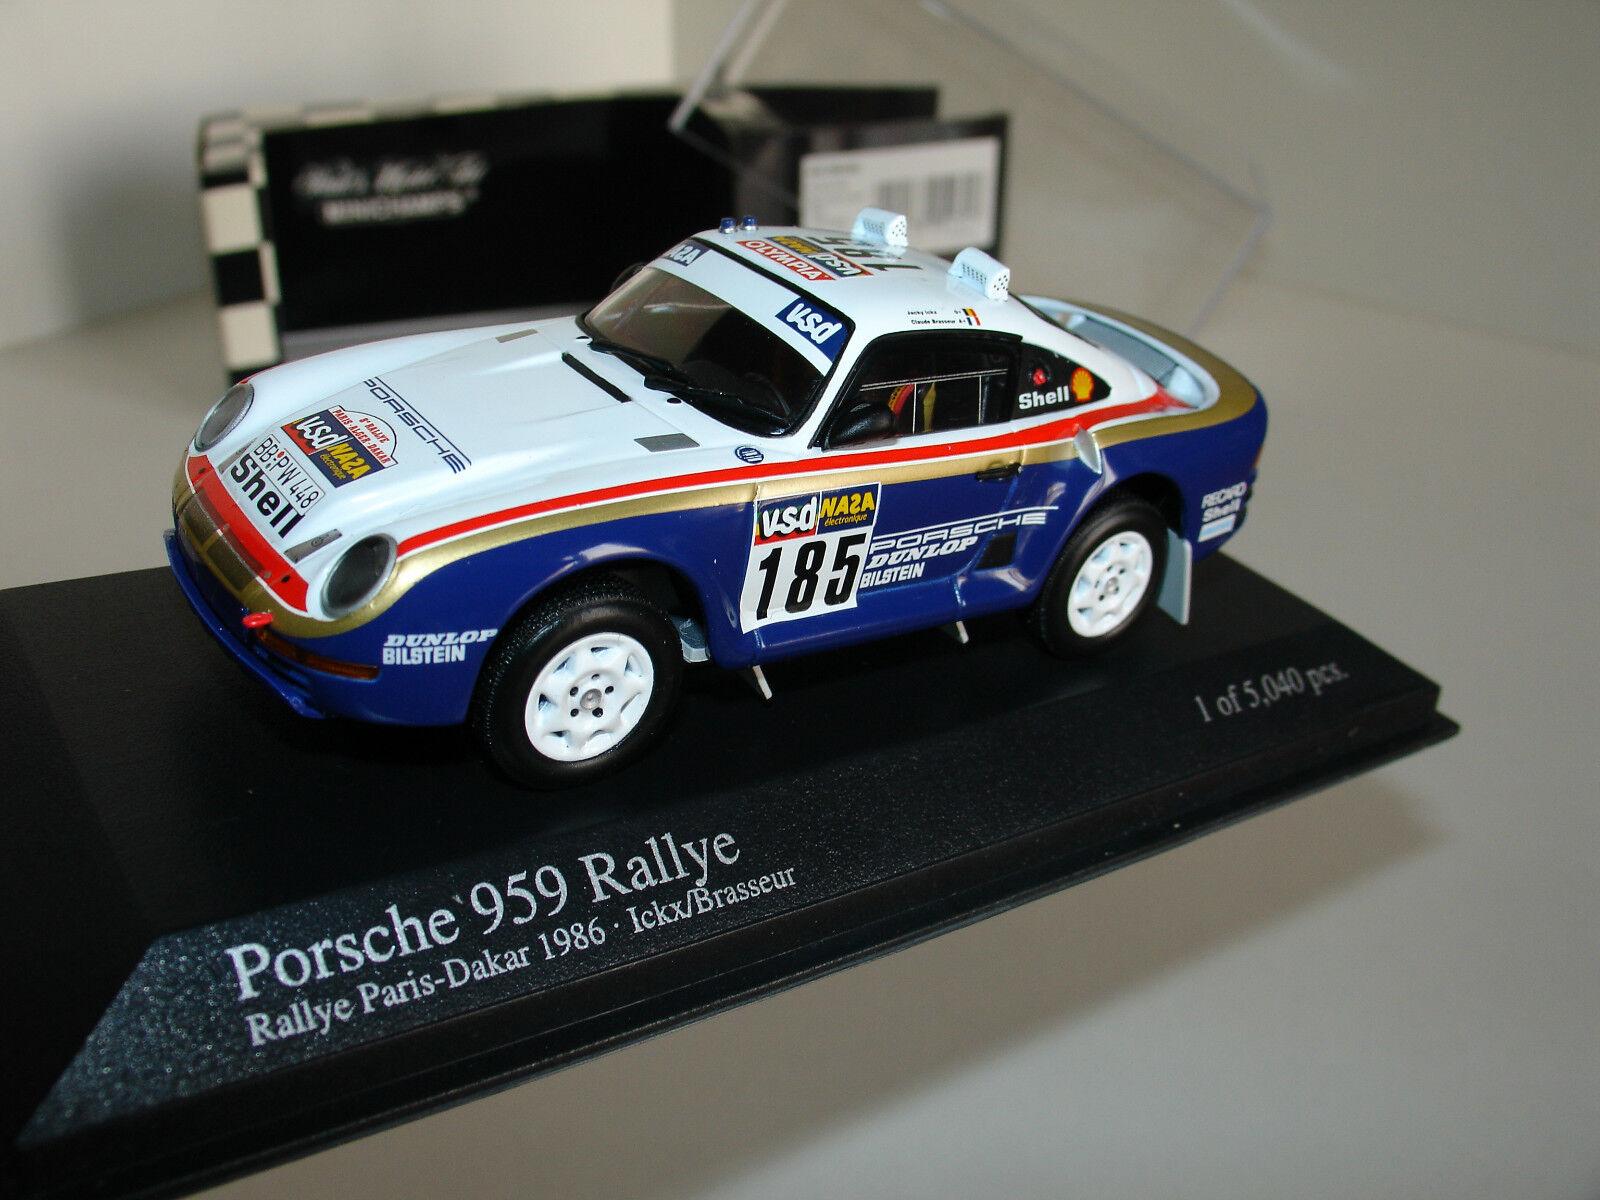 1 43 Porsche 959 Rallye Paris-Dakar 1986  185 por Minichamps